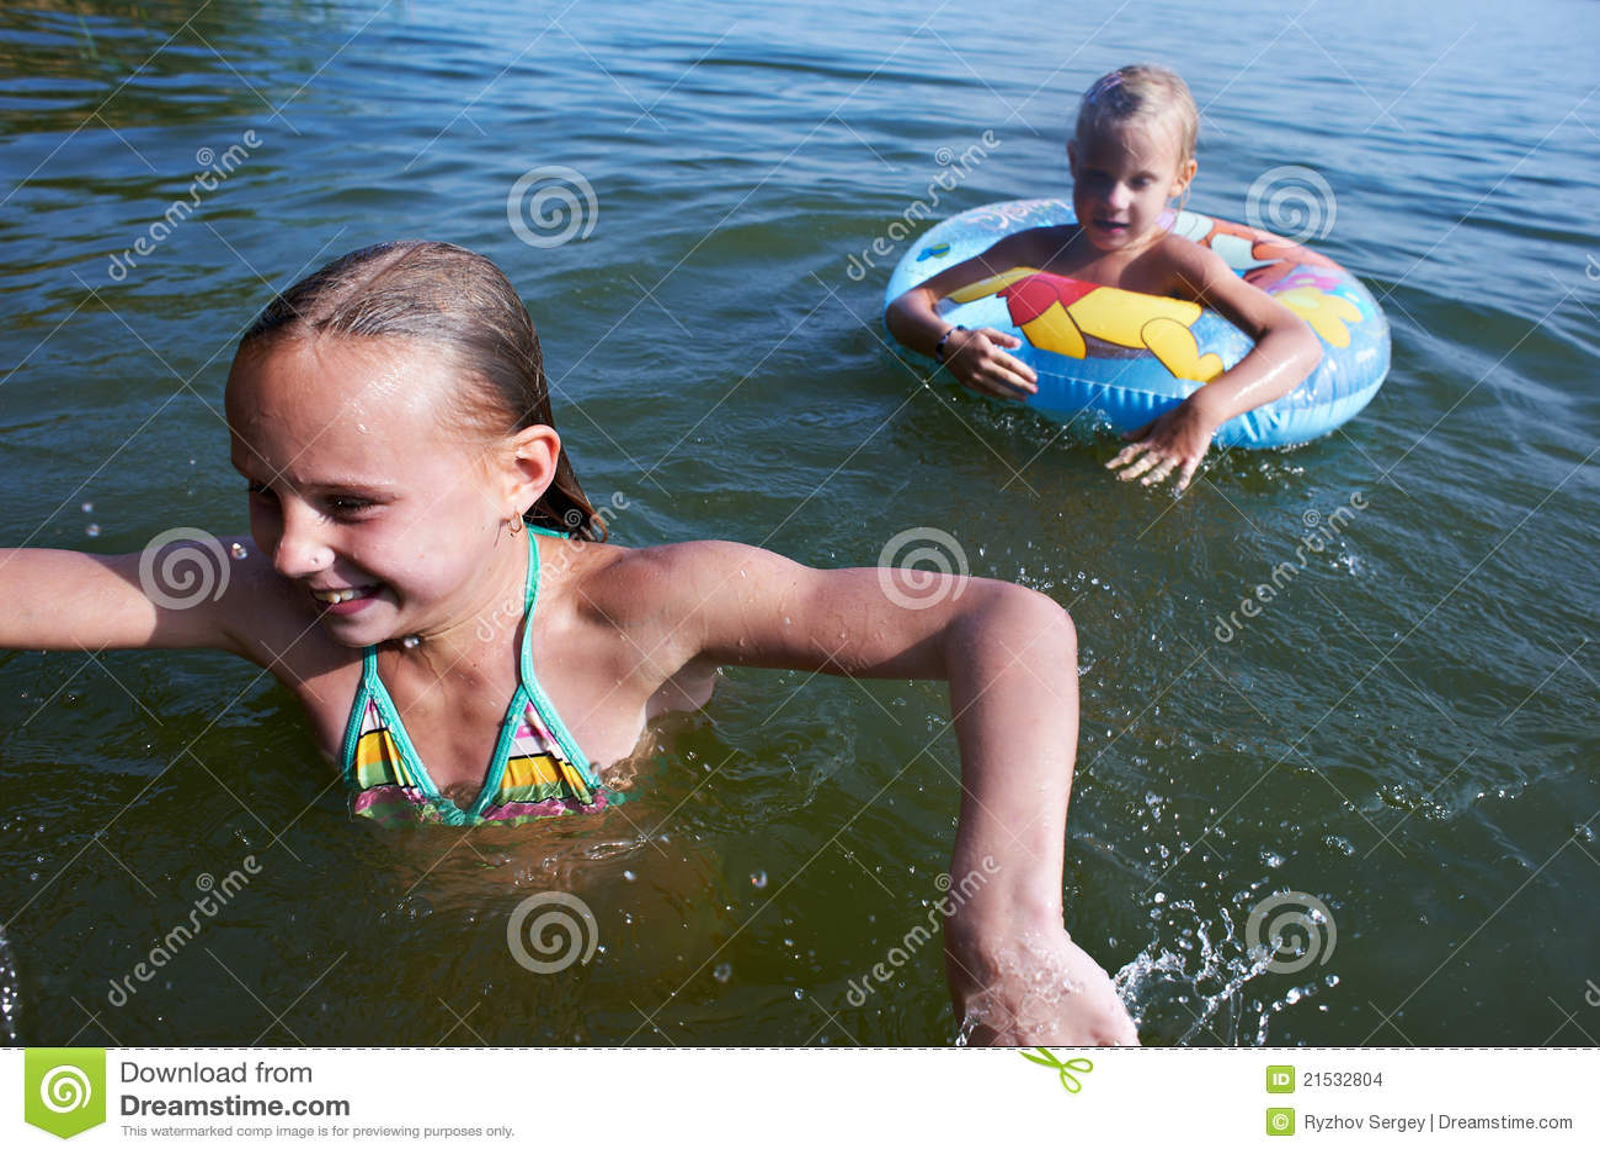 Kids Swimming In A Lake two swimming kids in lake royalty free stock images - image: 14246529